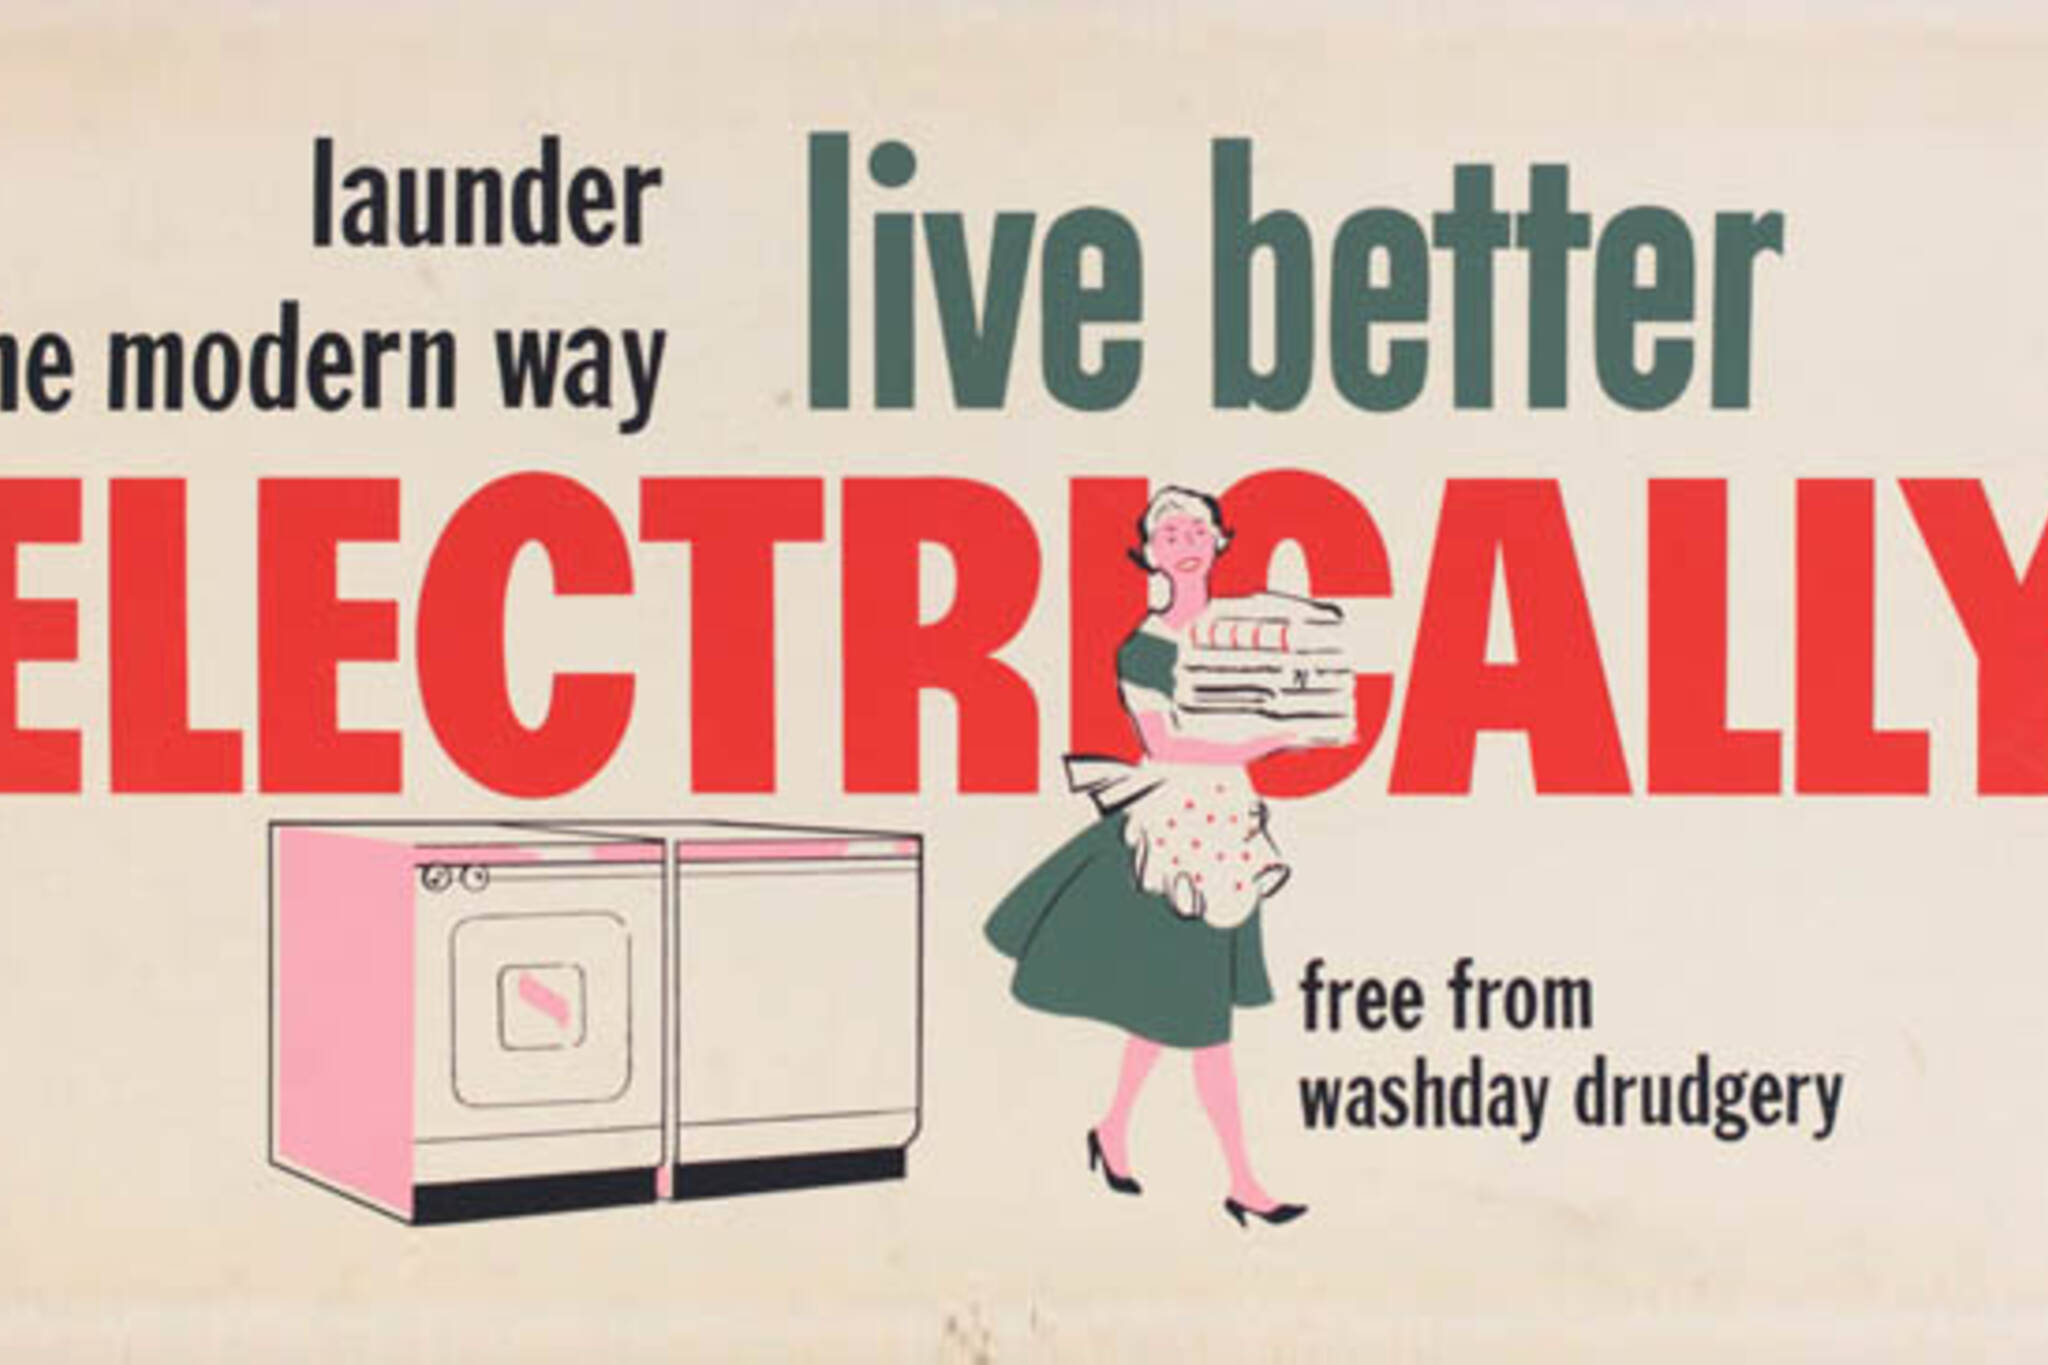 vintage ttc advertisements